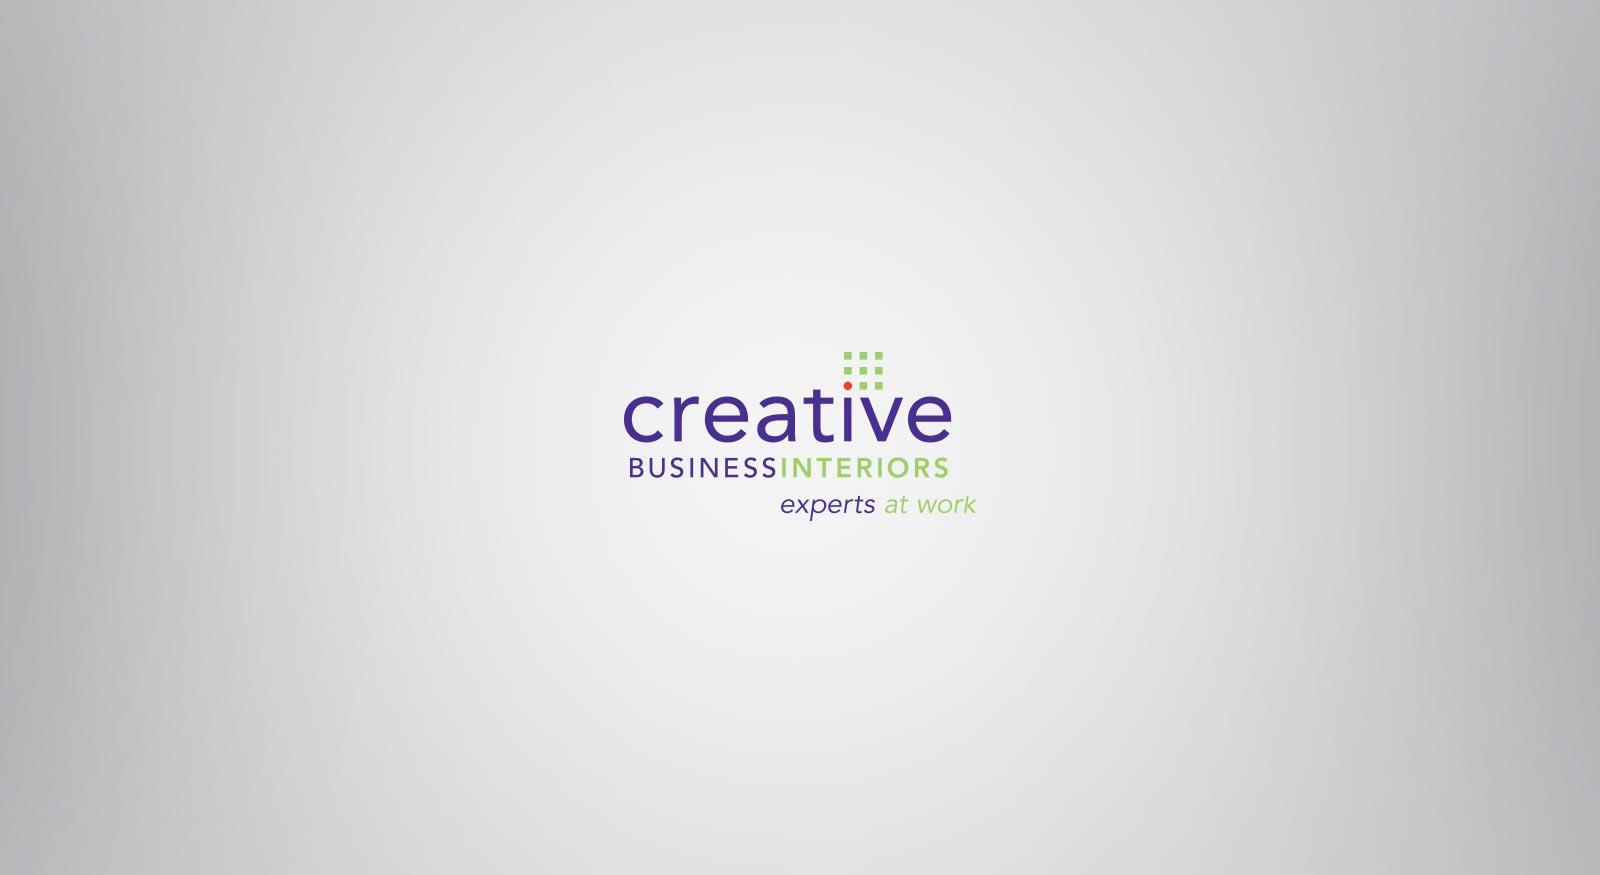 Amazing Creative Business Interiors